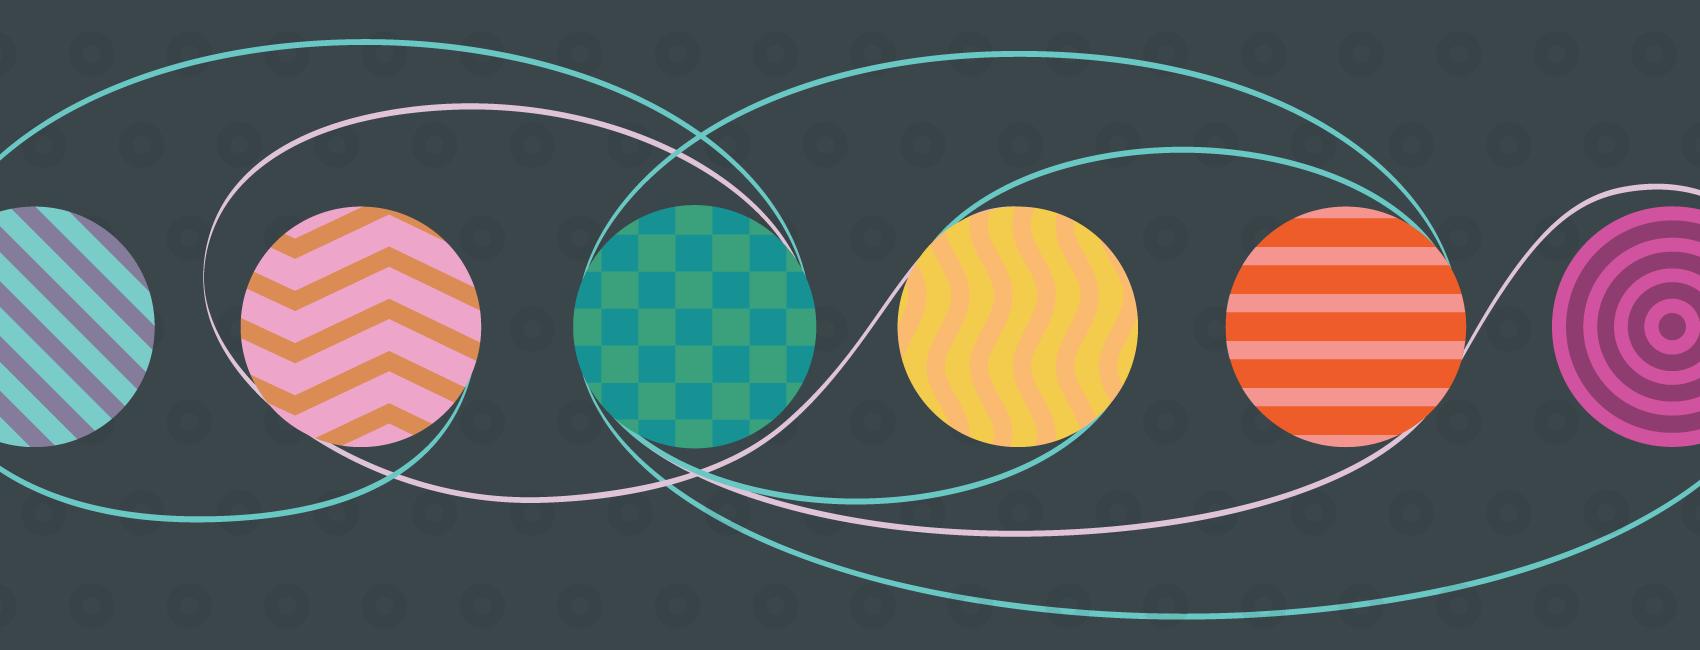 201312_design_thinking_chart